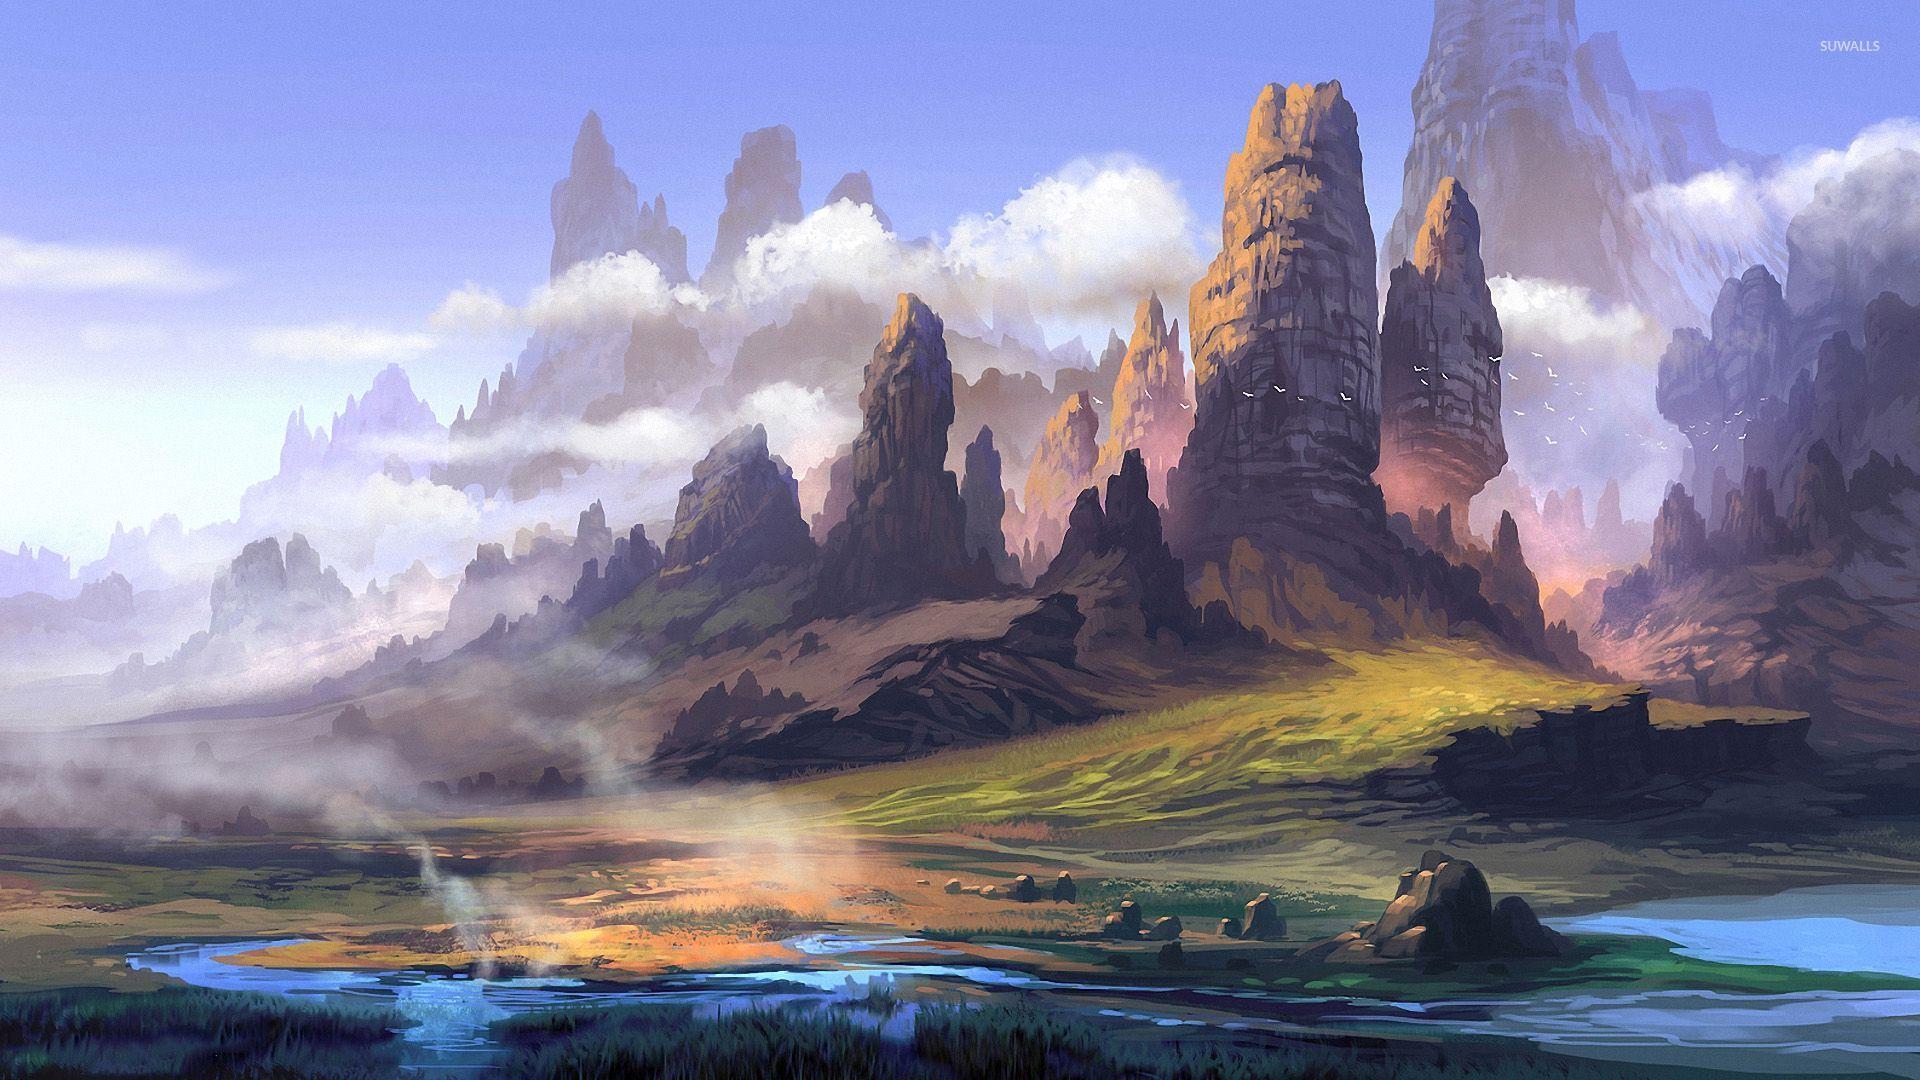 Fantastic Wallpaper Mountain Windows 10 - rocky-peaks-reaching-to-the-clouds-47052-1920x1080  Snapshot_597691.jpg